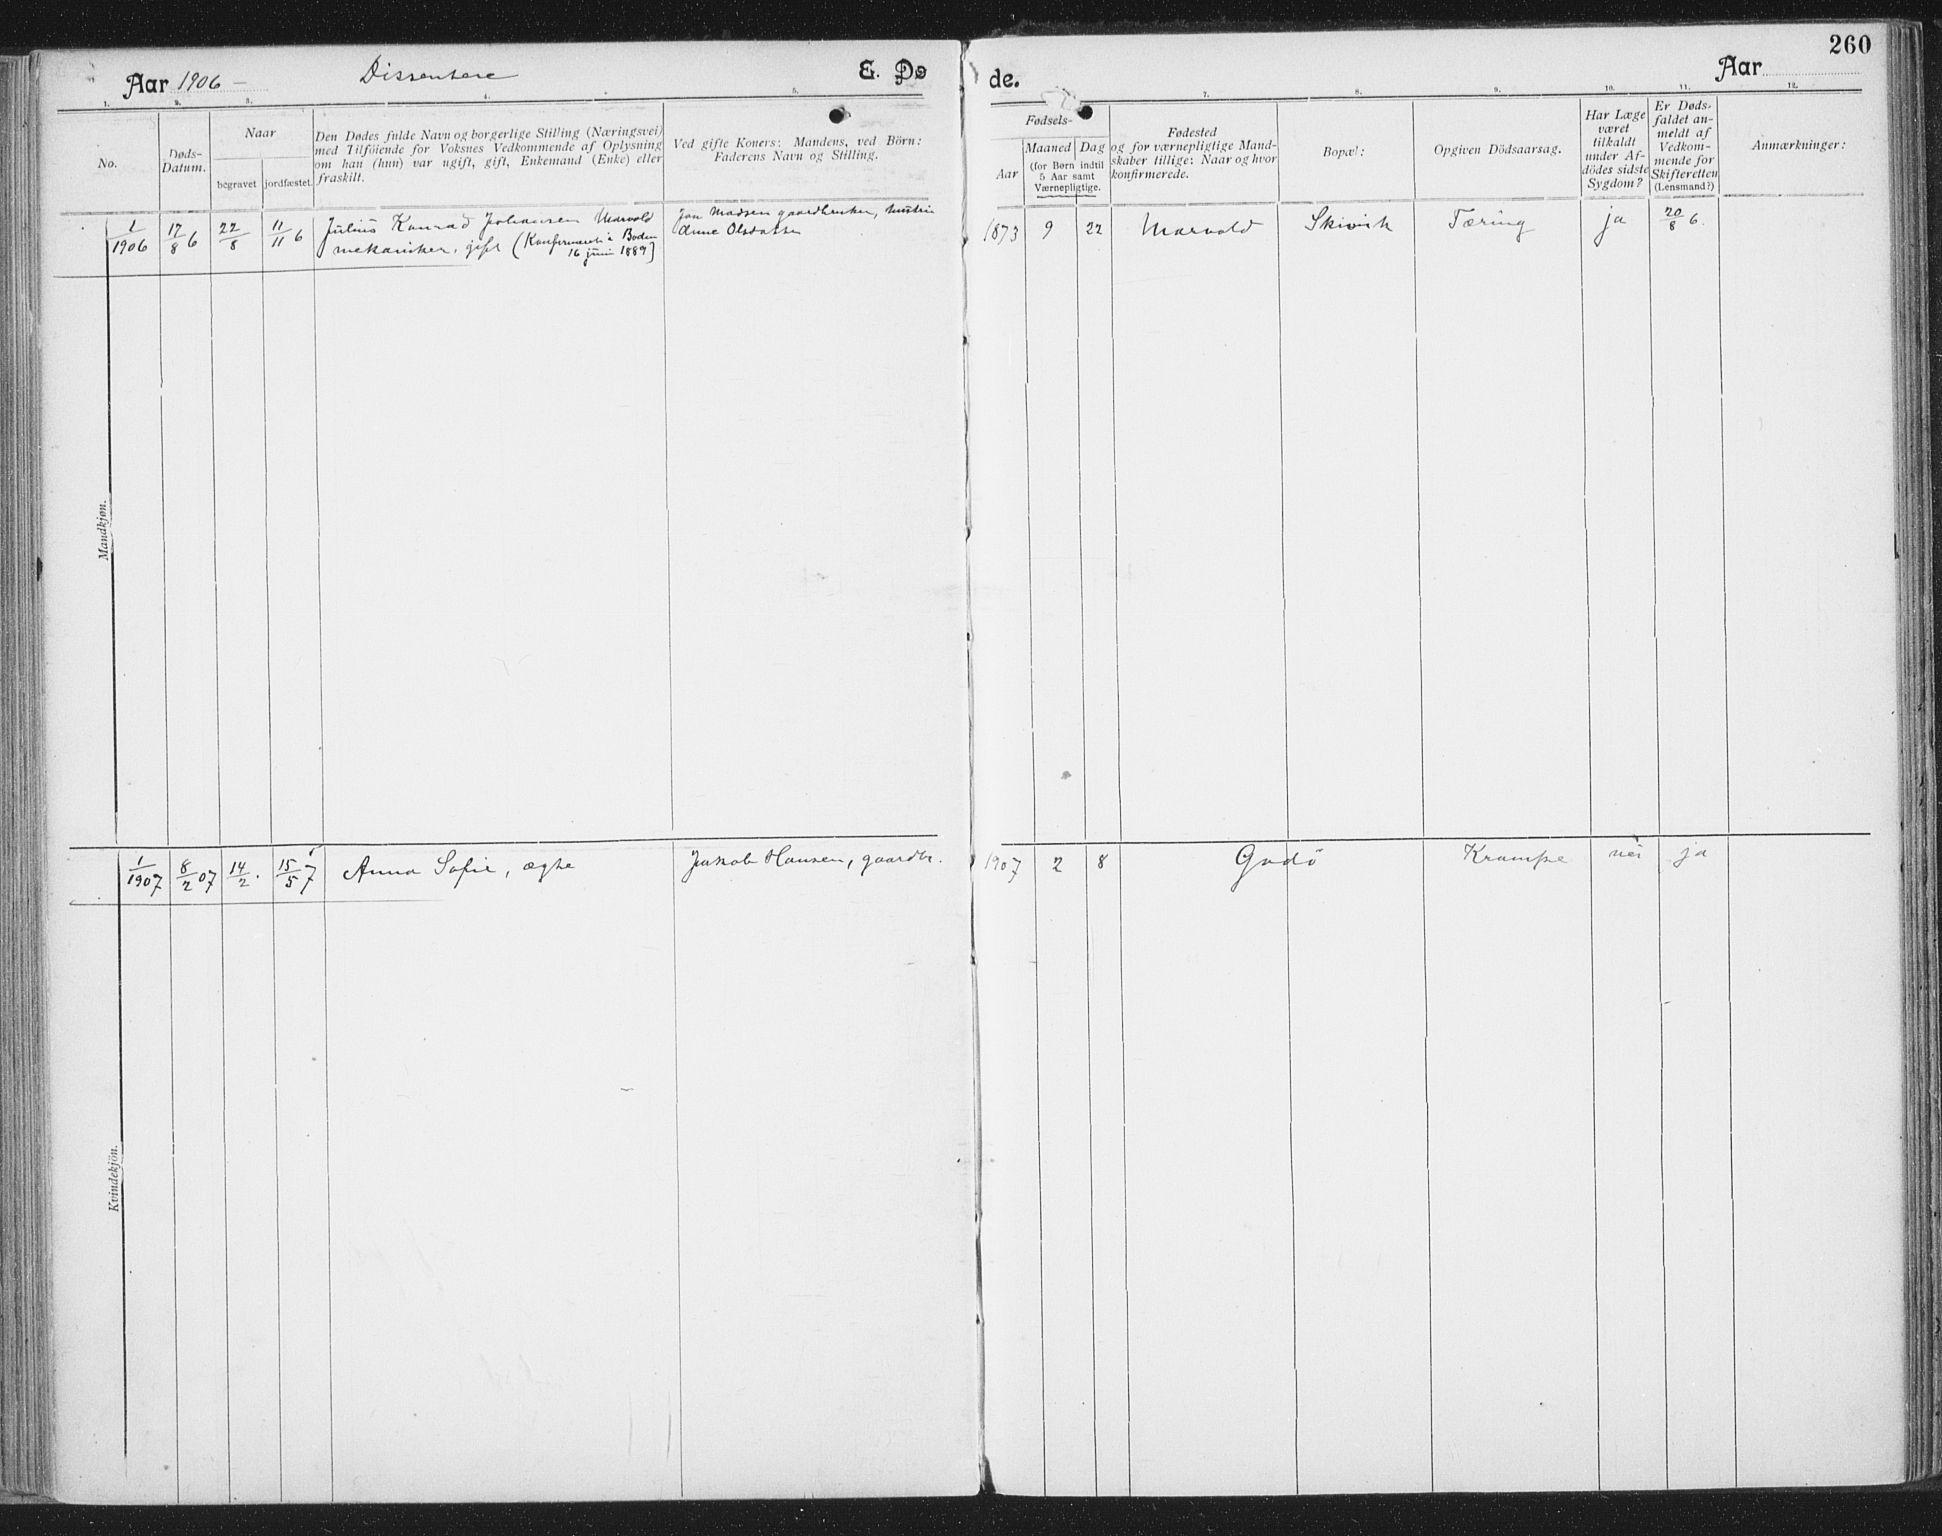 SAT, Ministerialprotokoller, klokkerbøker og fødselsregistre - Nordland, 804/L0081: Ministerialbok nr. 804A02, 1901-1915, s. 260